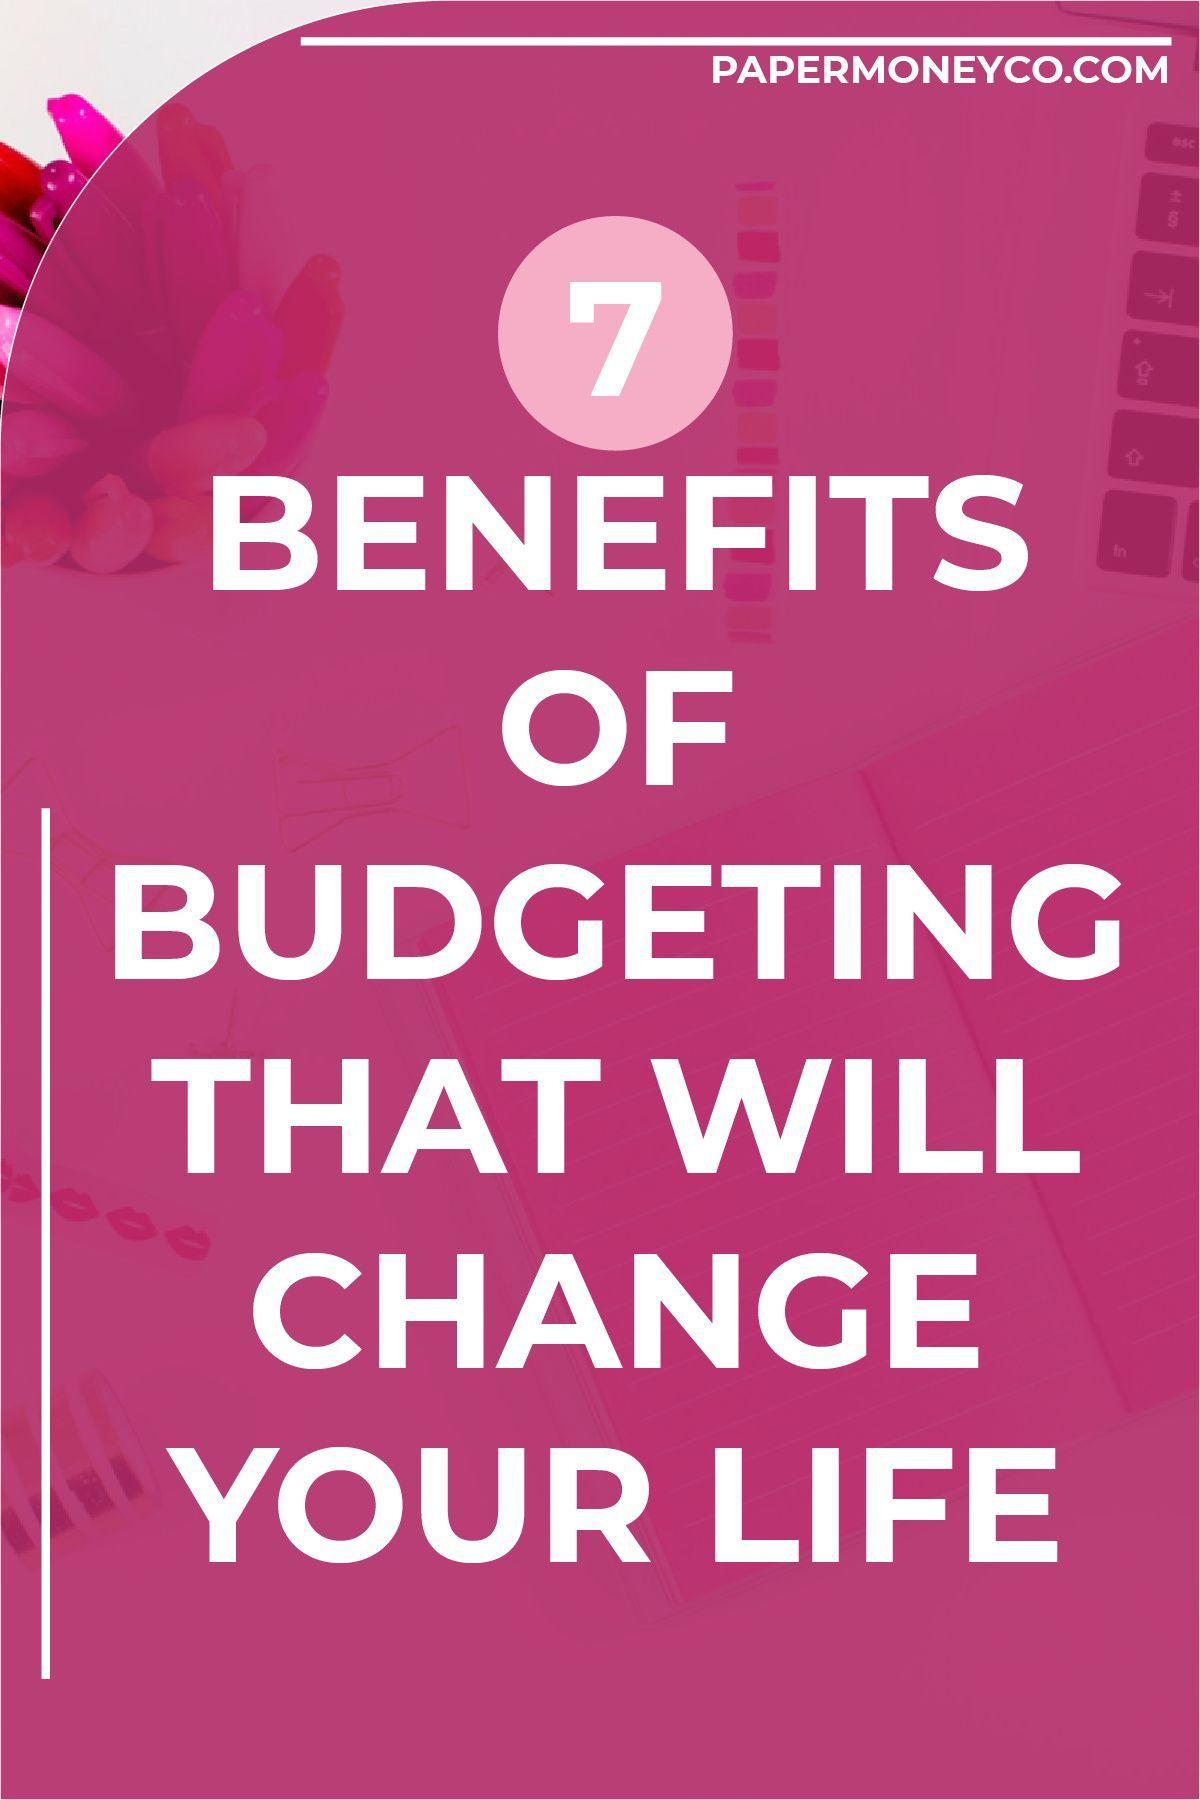 Lifechanging Benefits Of Budgeting Budgeting Budget Help Debt Payoff